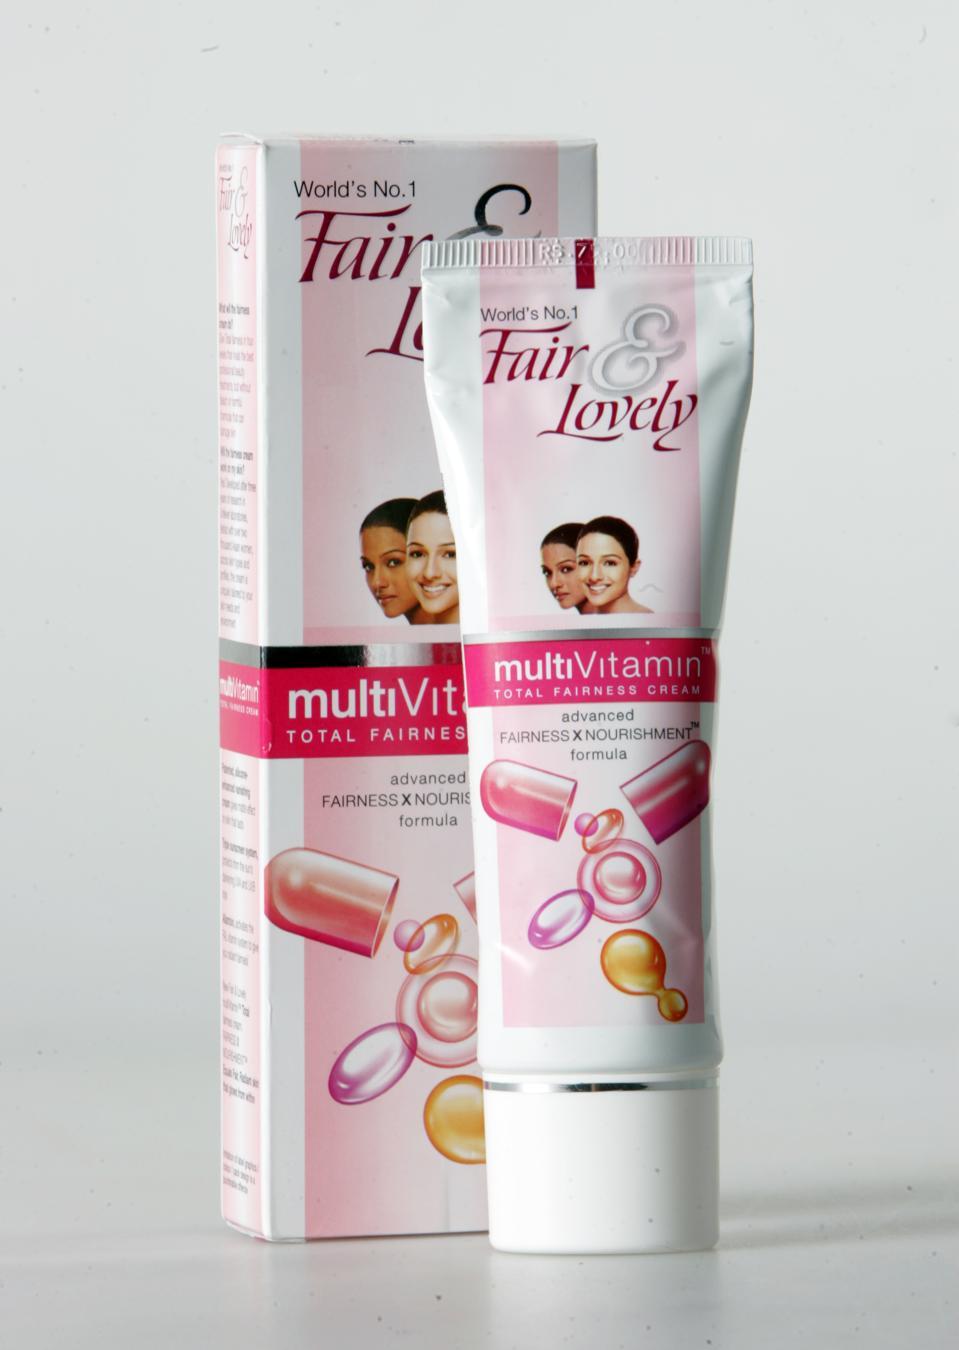 28/02/07-FAIR AND LOVELY CREAM-Product shot of tube and box of Fair & Lovely skin lightener, sold in